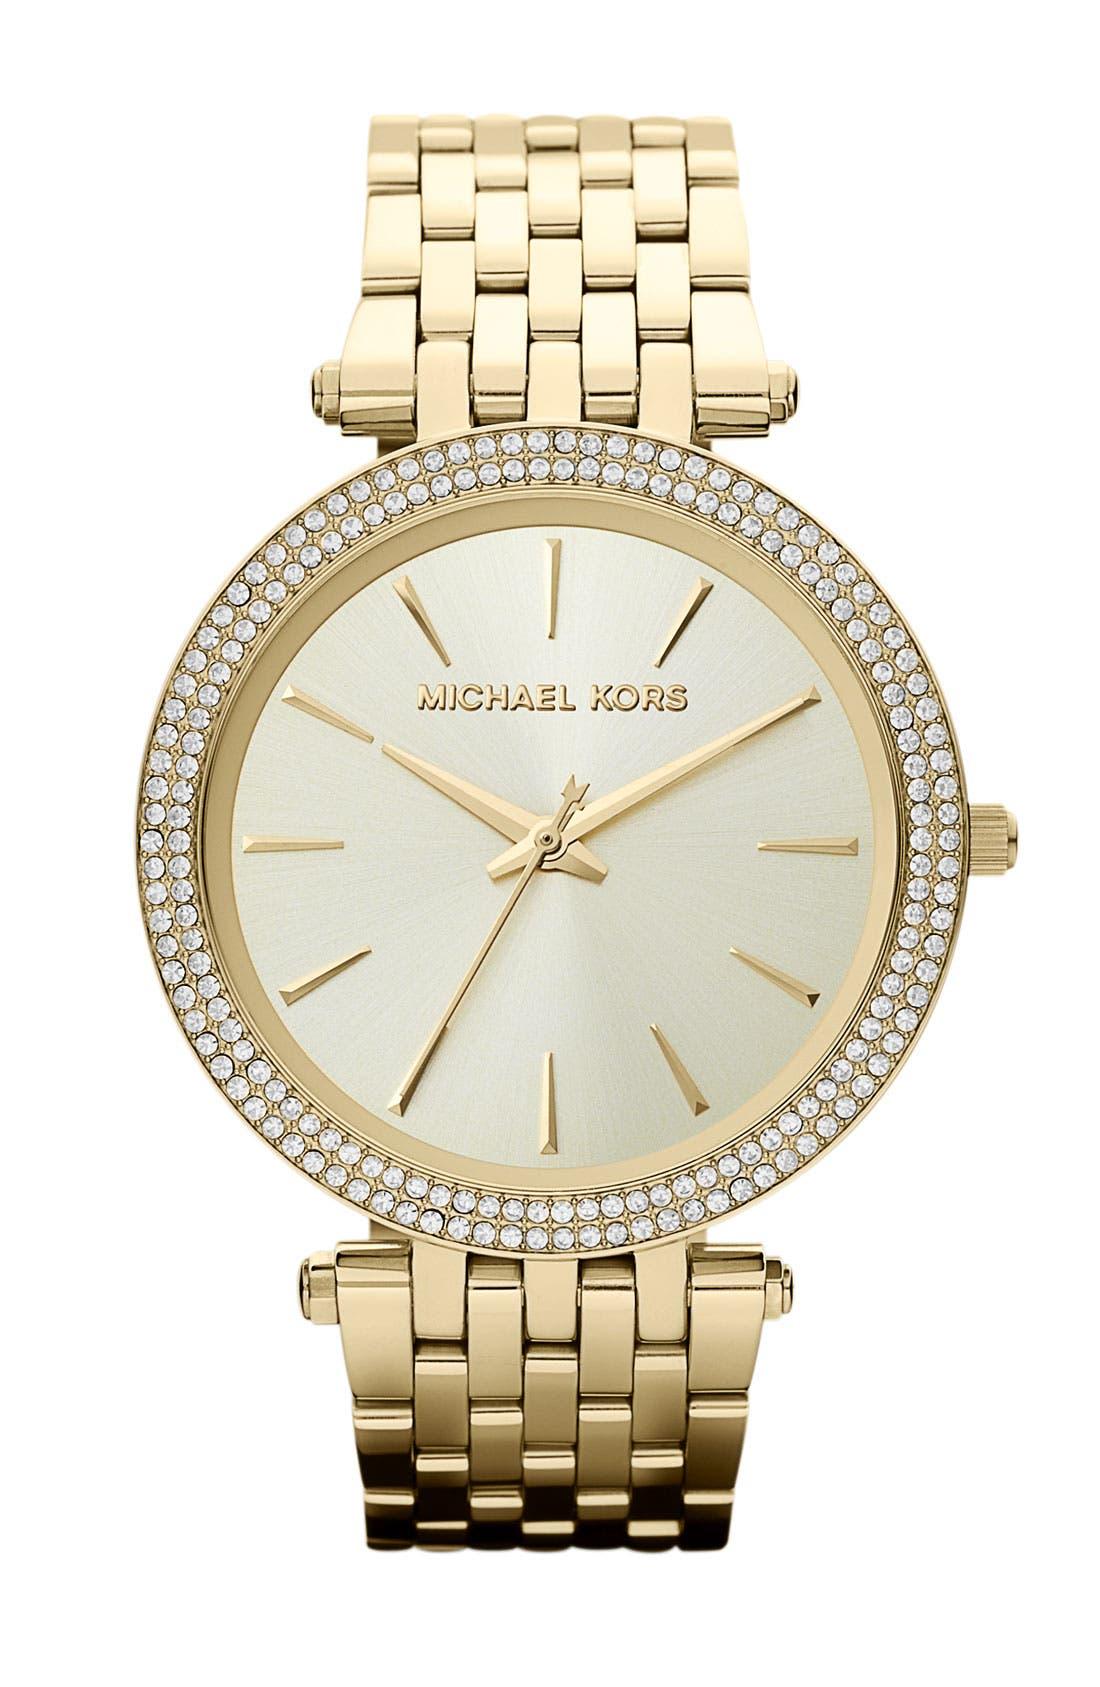 Michael Kors 'Darci' Round Bracelet Watch, 39mm